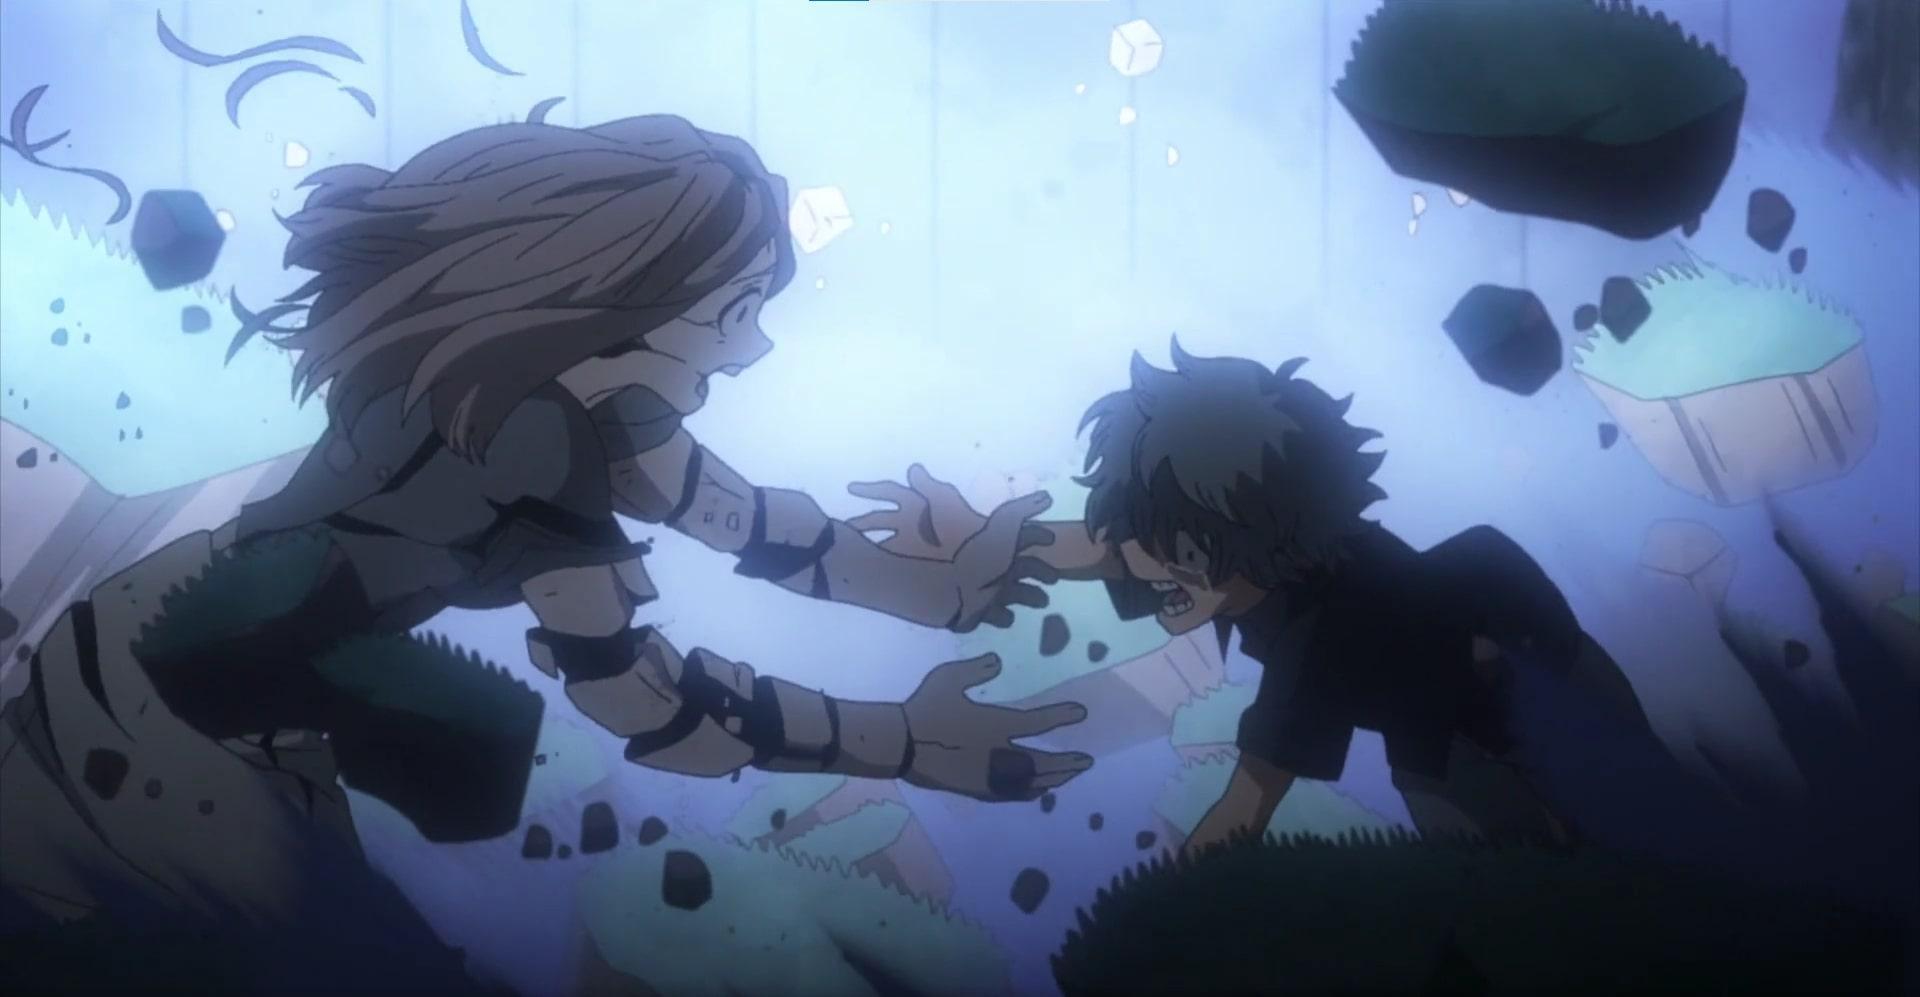 my-hero-academia-season-5-Episode-23-tomura-shigaraki